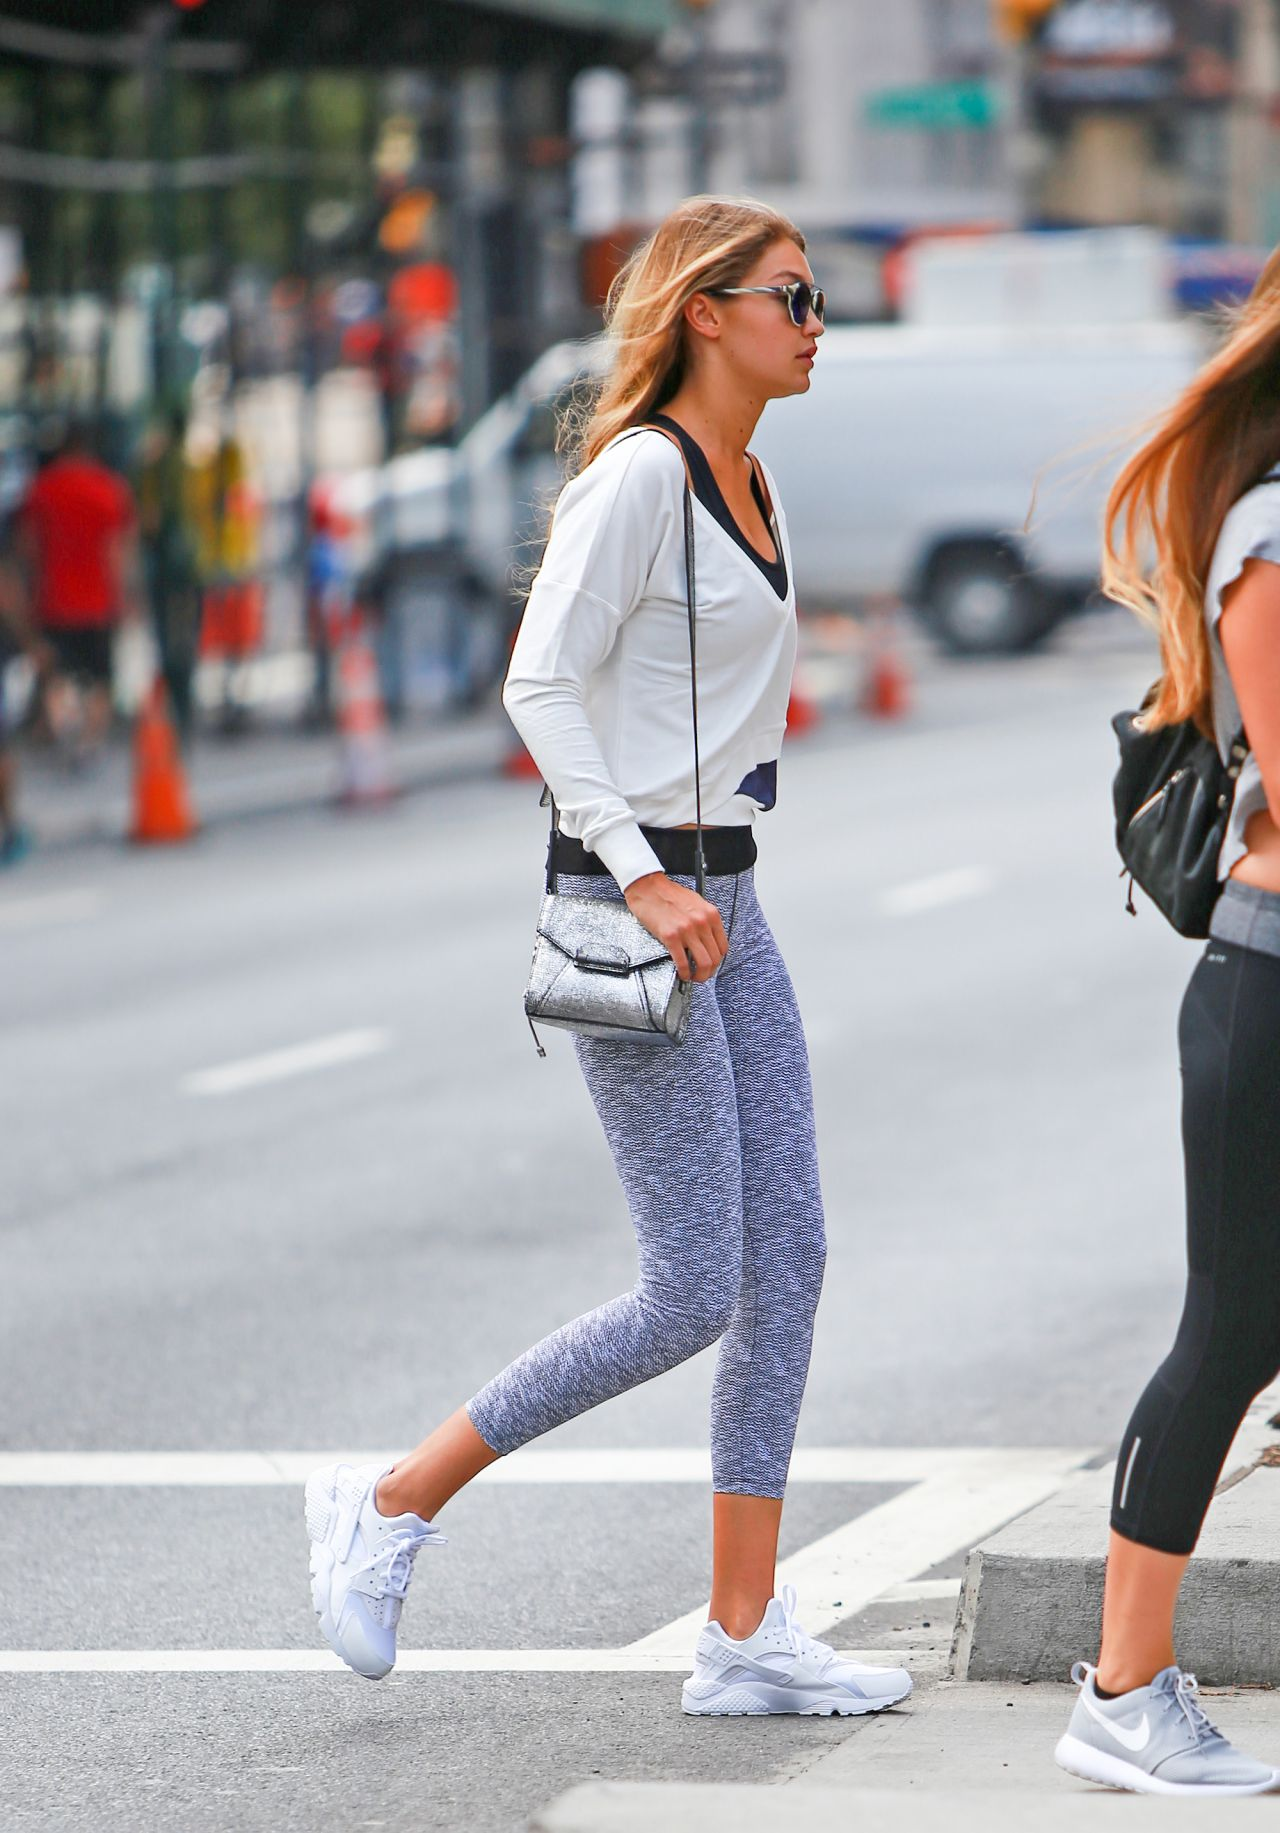 on sale online wide range full range of specifications Gigi Hadid in Leggings - Out in New York City, September 2015